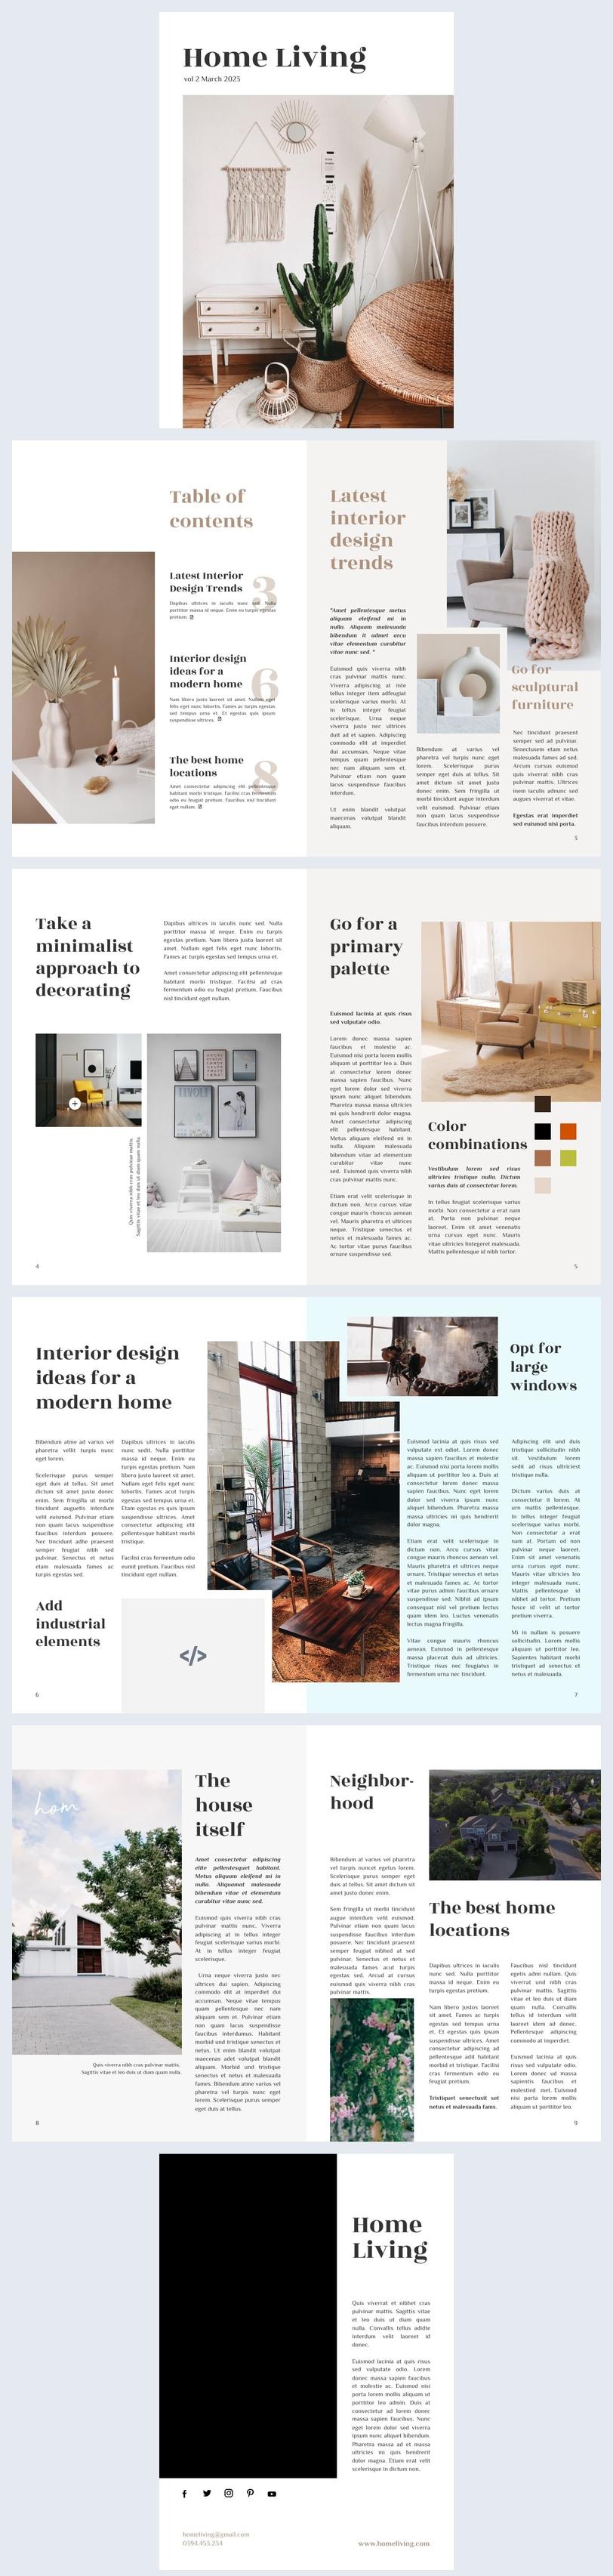 Home & Living Magazine Design Example